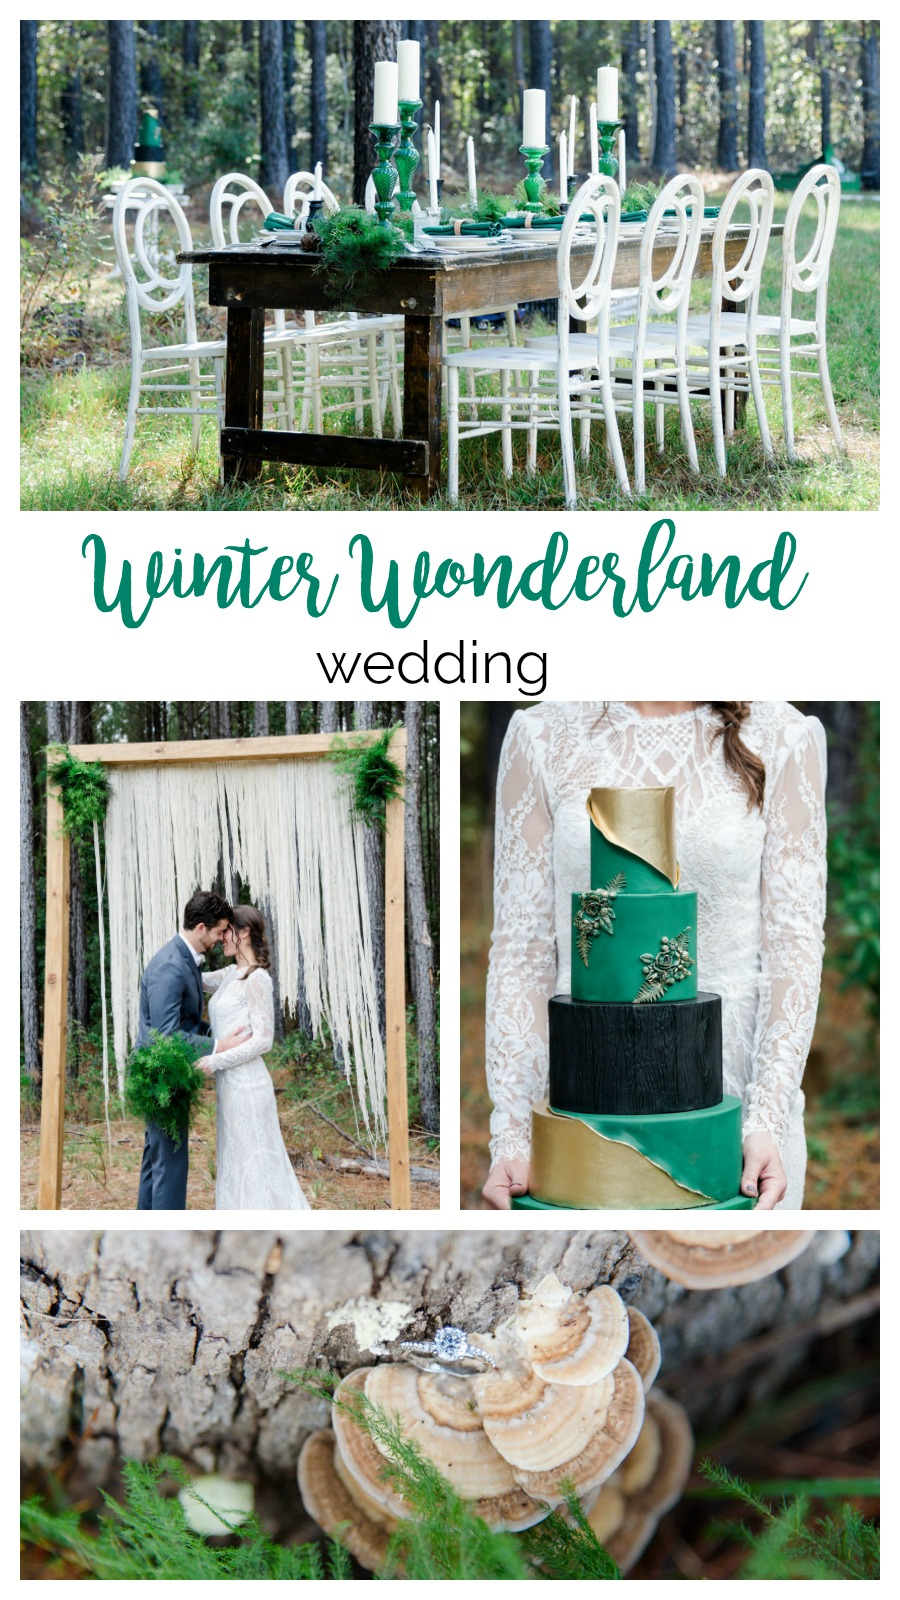 Green and Gold Winter Wonderland Wedding | Palmetto State Weddings | Leigh Heyward Photography | Charleston wedding | emerald wedding inspiration | Southern wedding inspiration